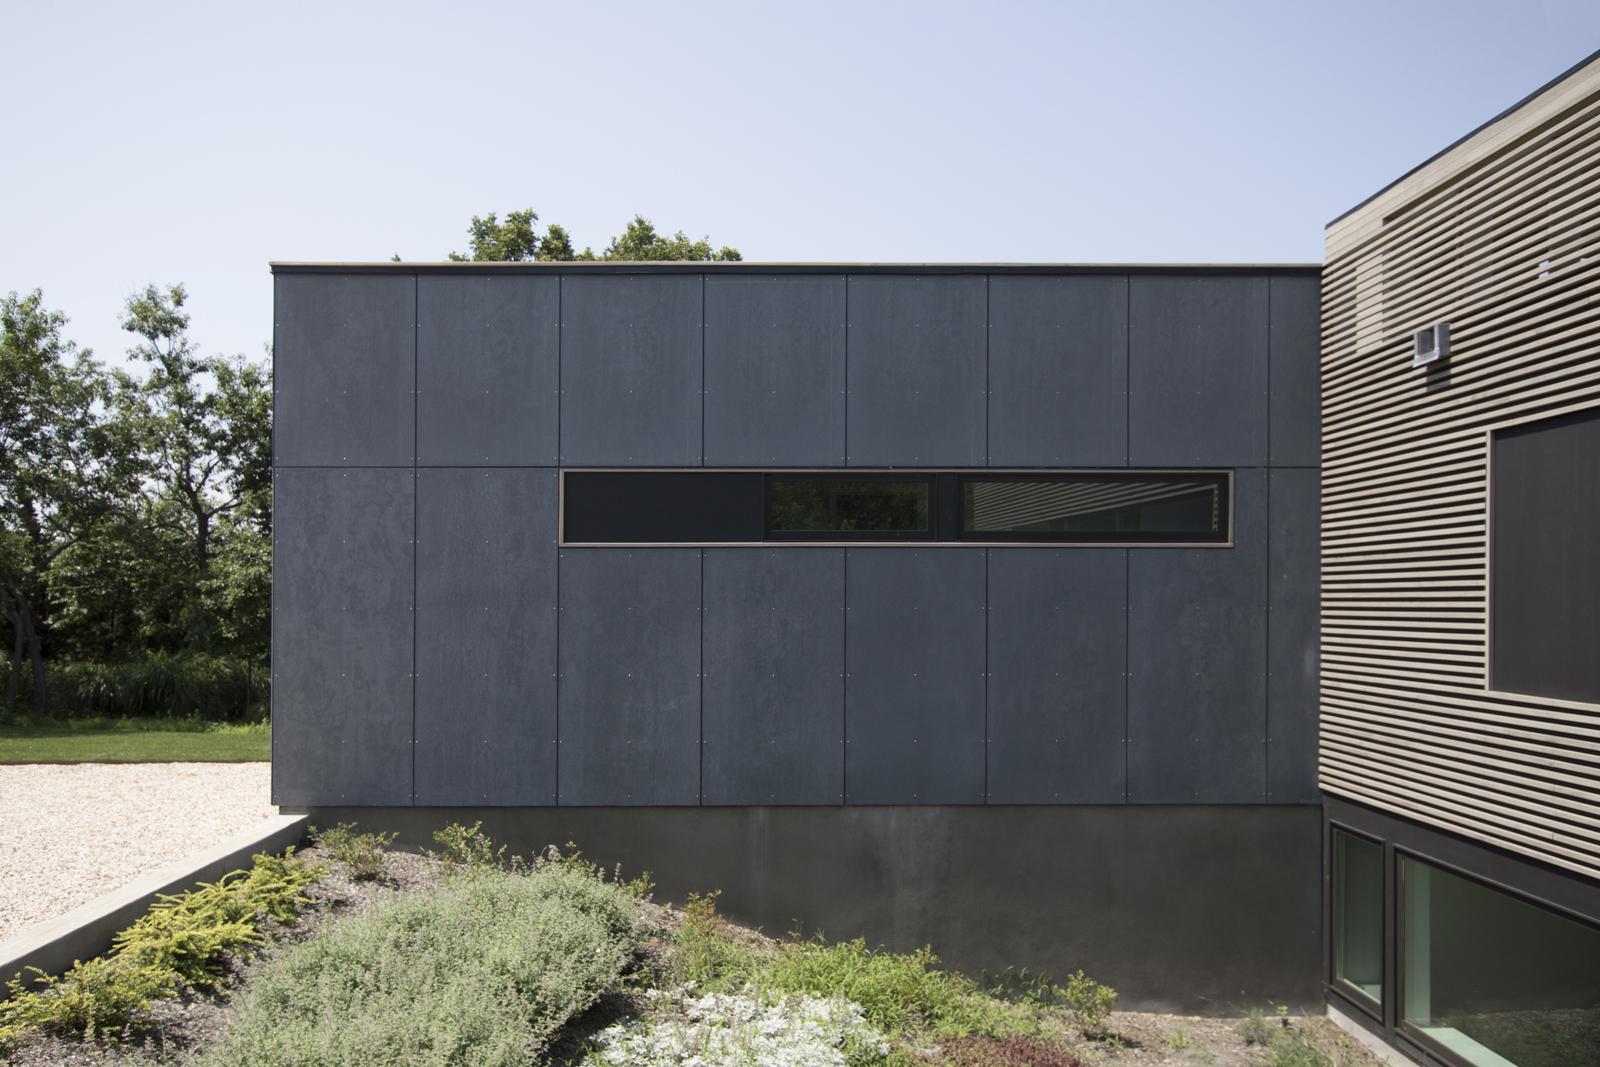 04-res4-resolution-4-architecture-modern-modular-house-prefab-home-north-fork-bluff-house-exterior-facade-elevation.jpg